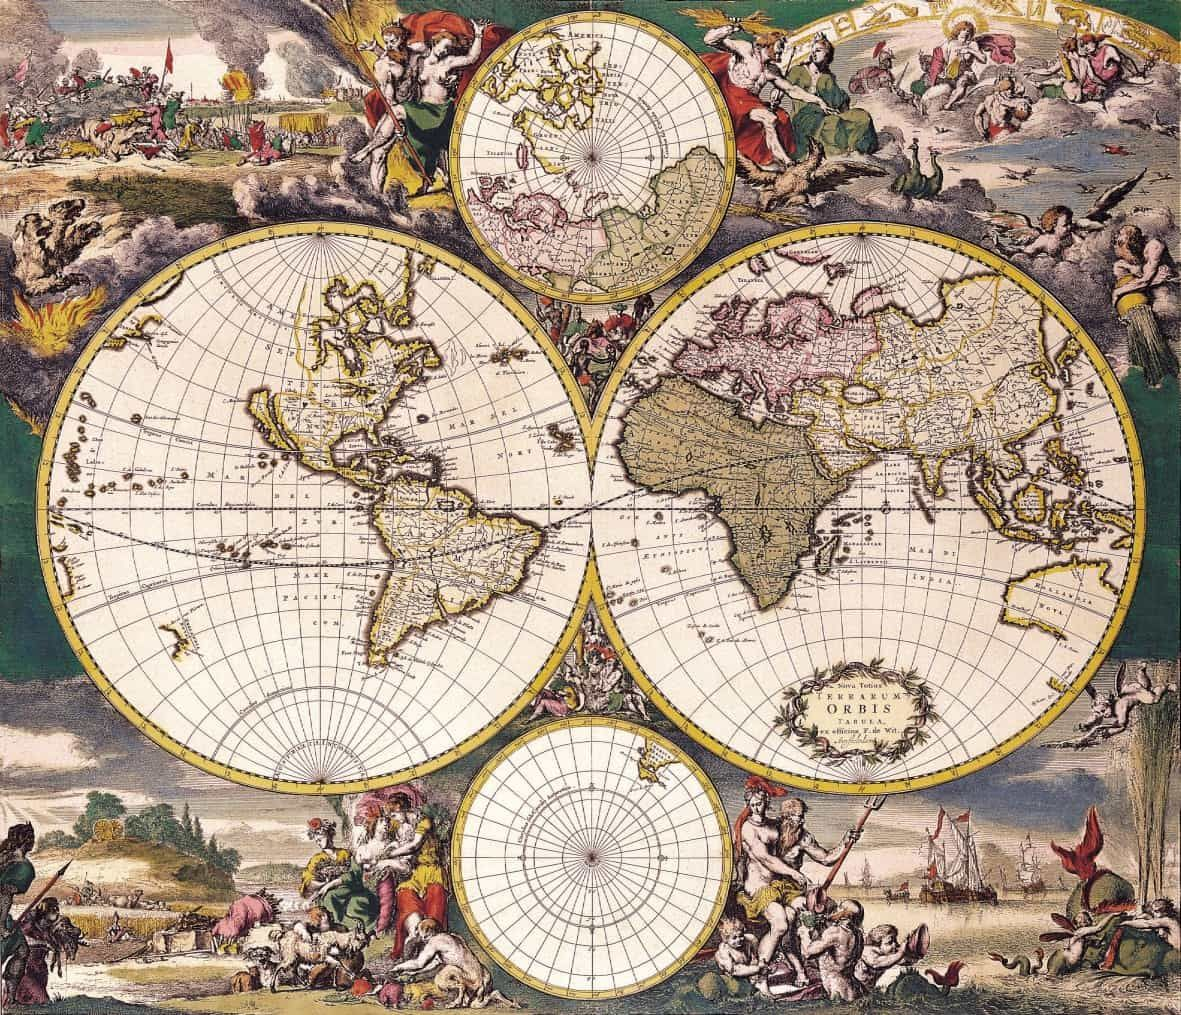 Ancient map 1690 nova totius terrarum orbis tabula ancient ancient map 1690 nova totius terrarum orbis tabula ancient antique atlas classic gumiabroncs Image collections